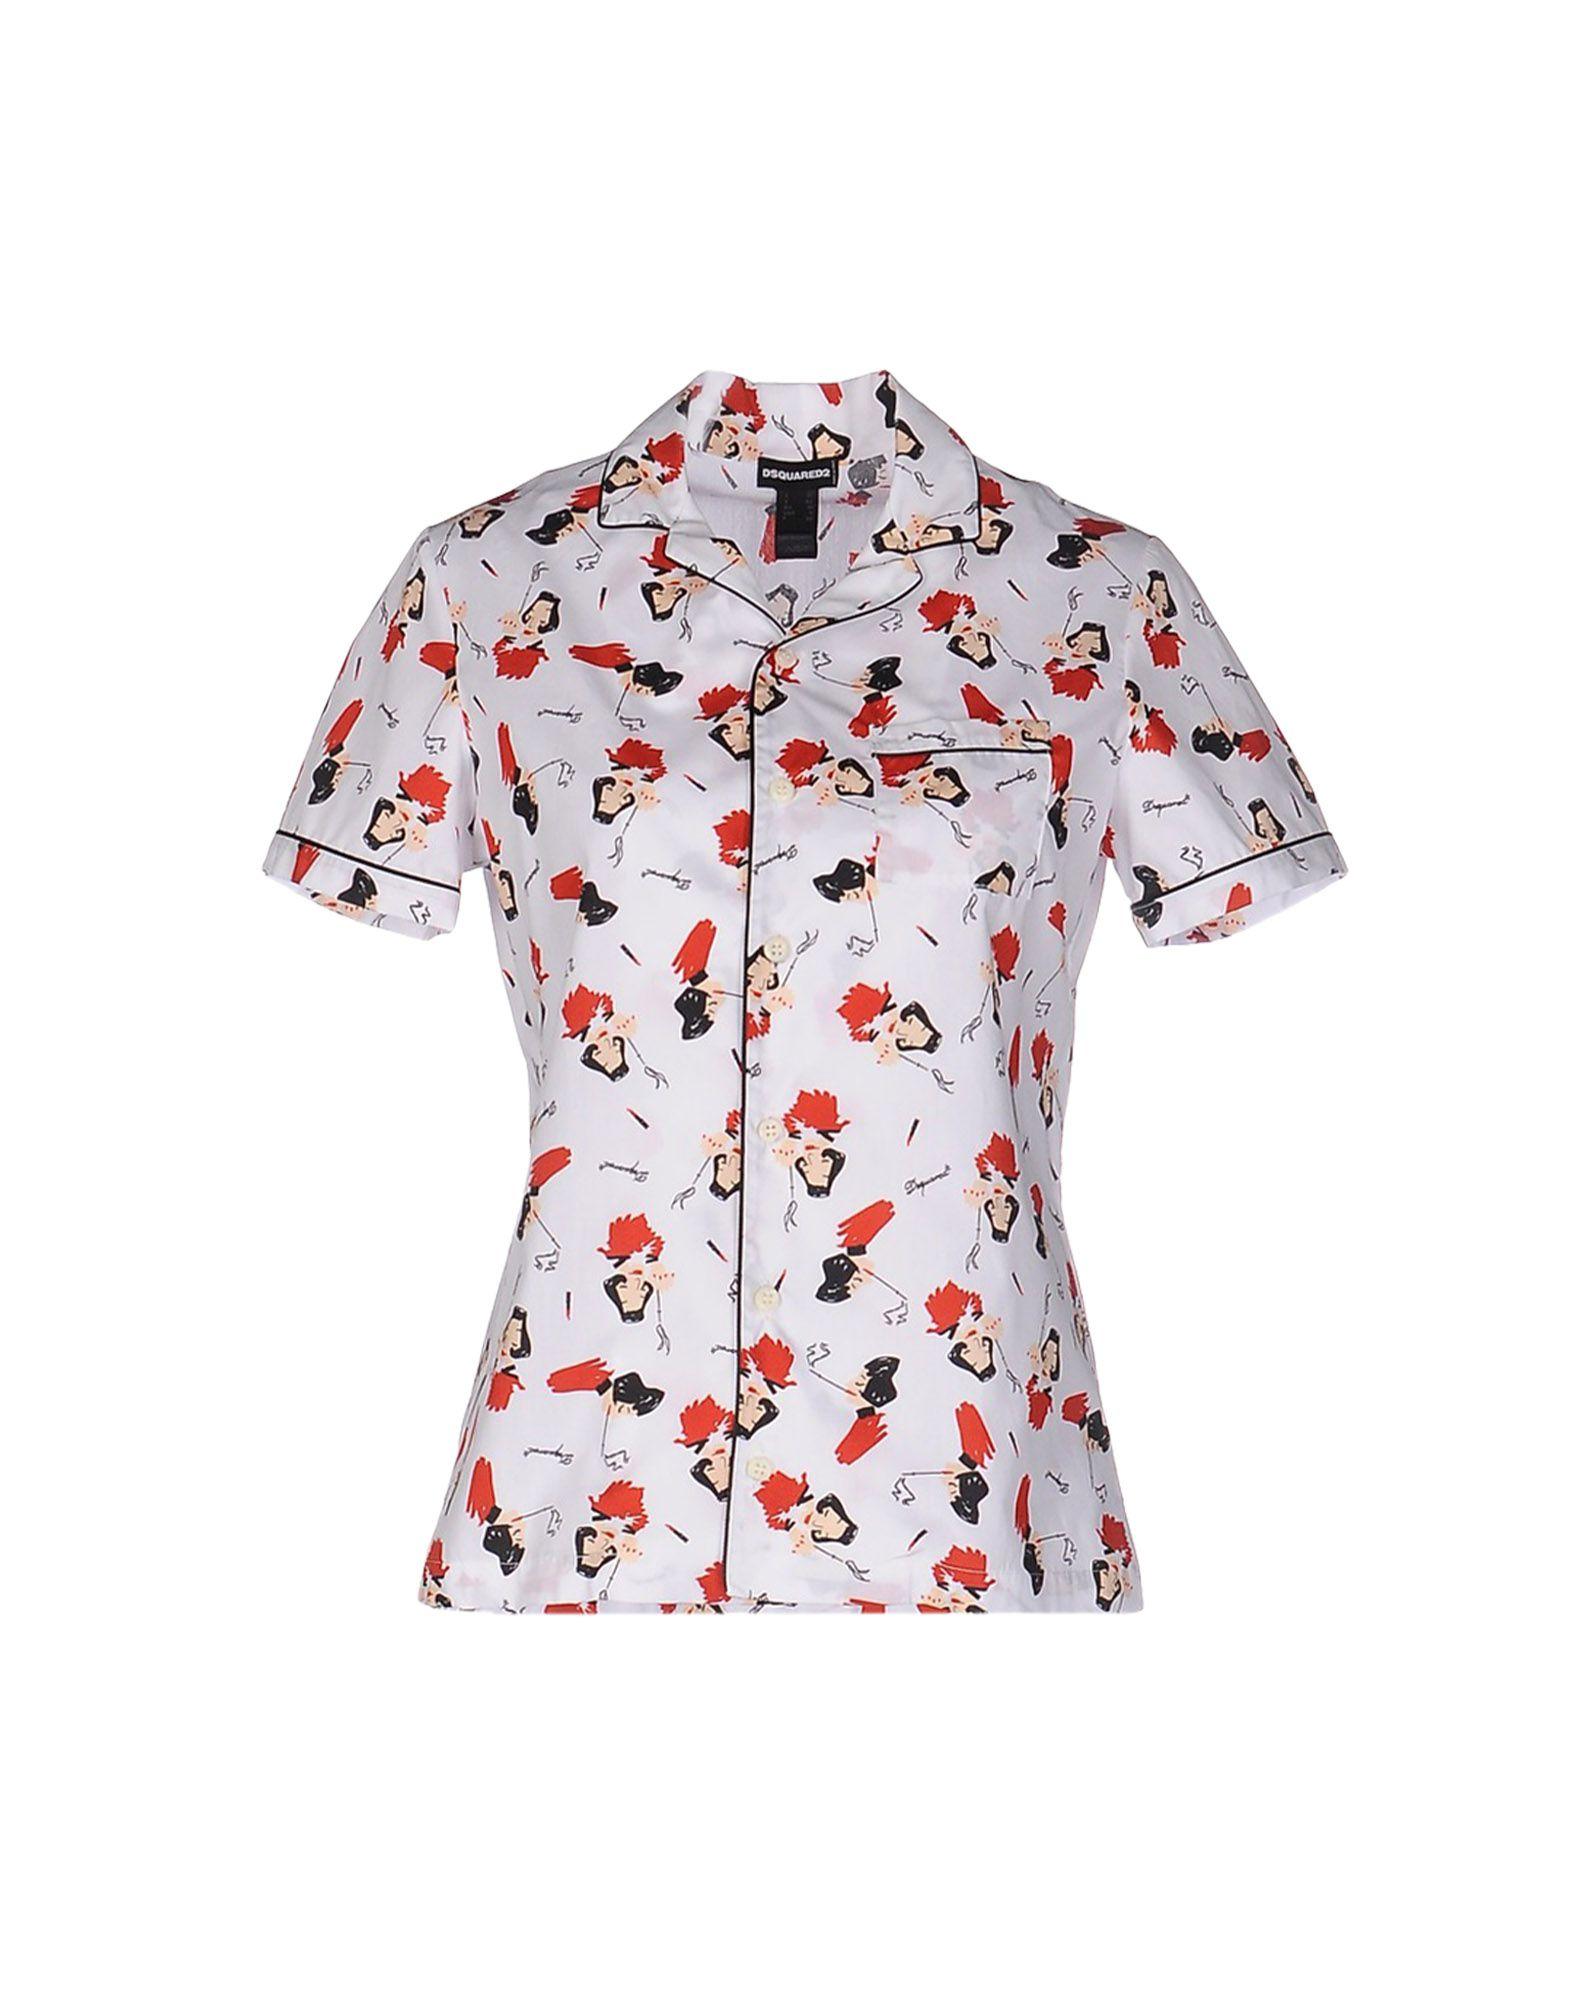 DSQUARED2 Ночная рубашка рубашка ночная с макраме